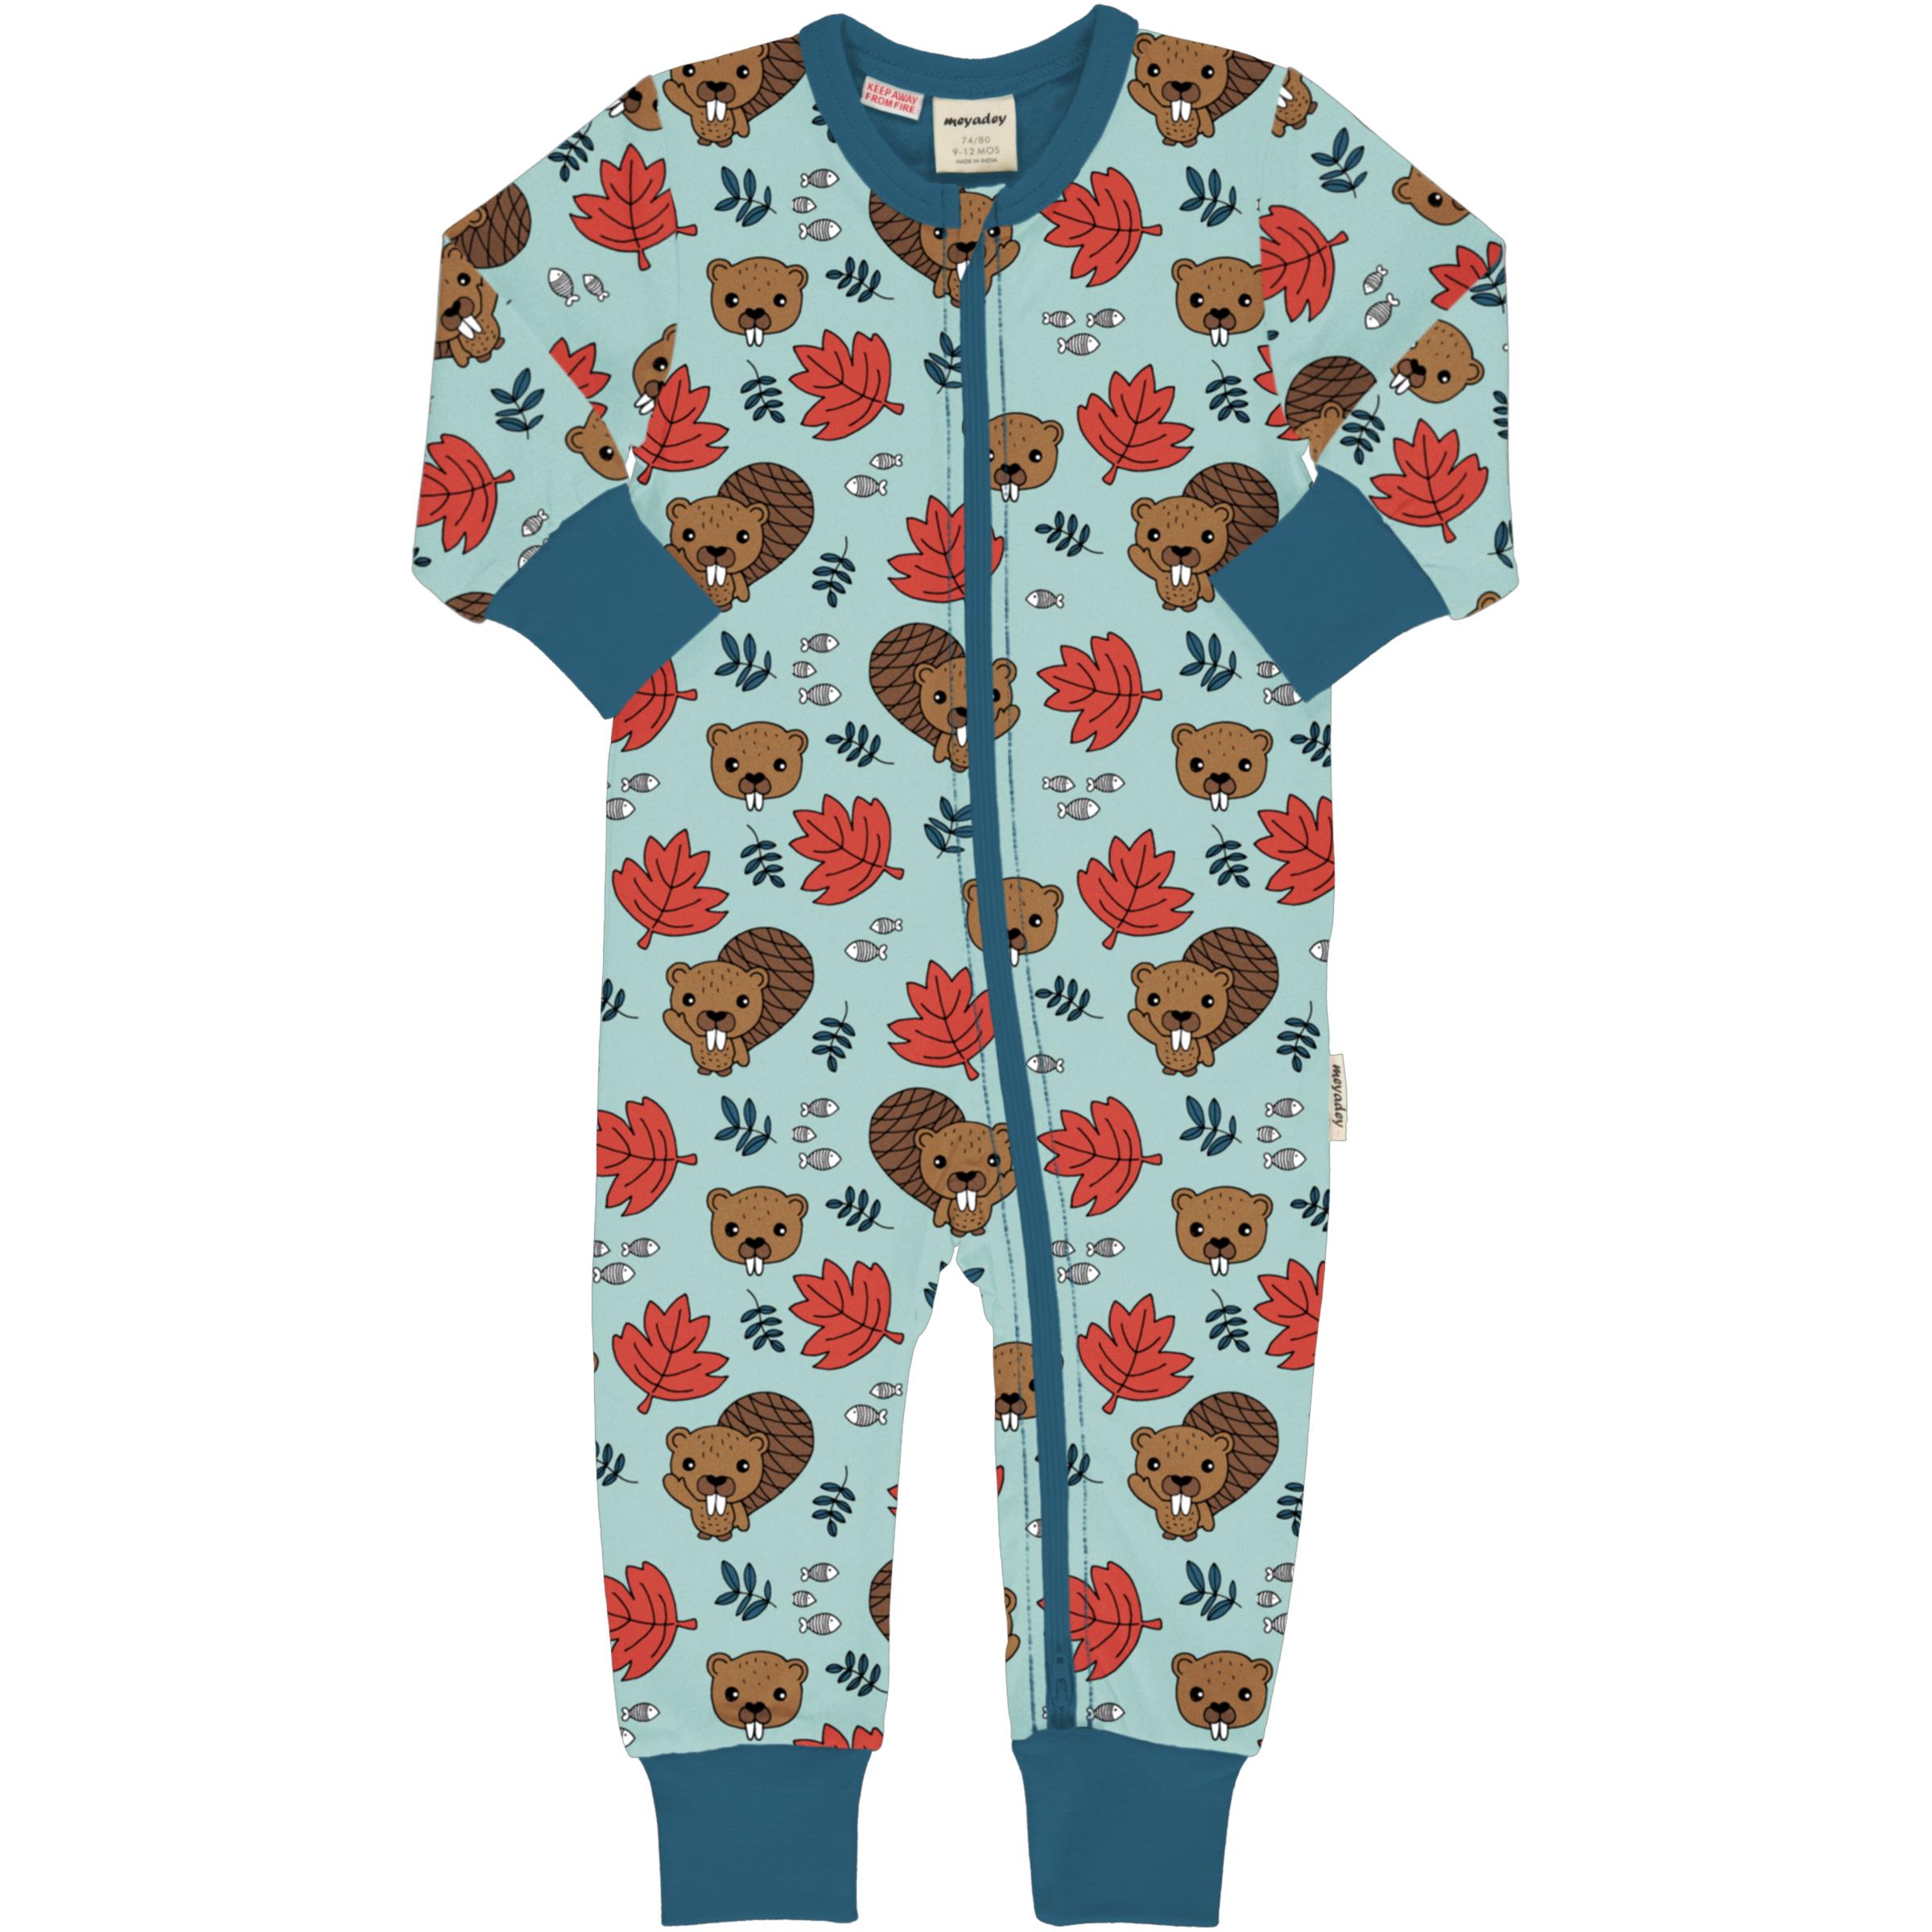 Meyadey by Maxomorra Baby Schlafanzug Einteiler Lang BEAVER FRIENDS 062/068